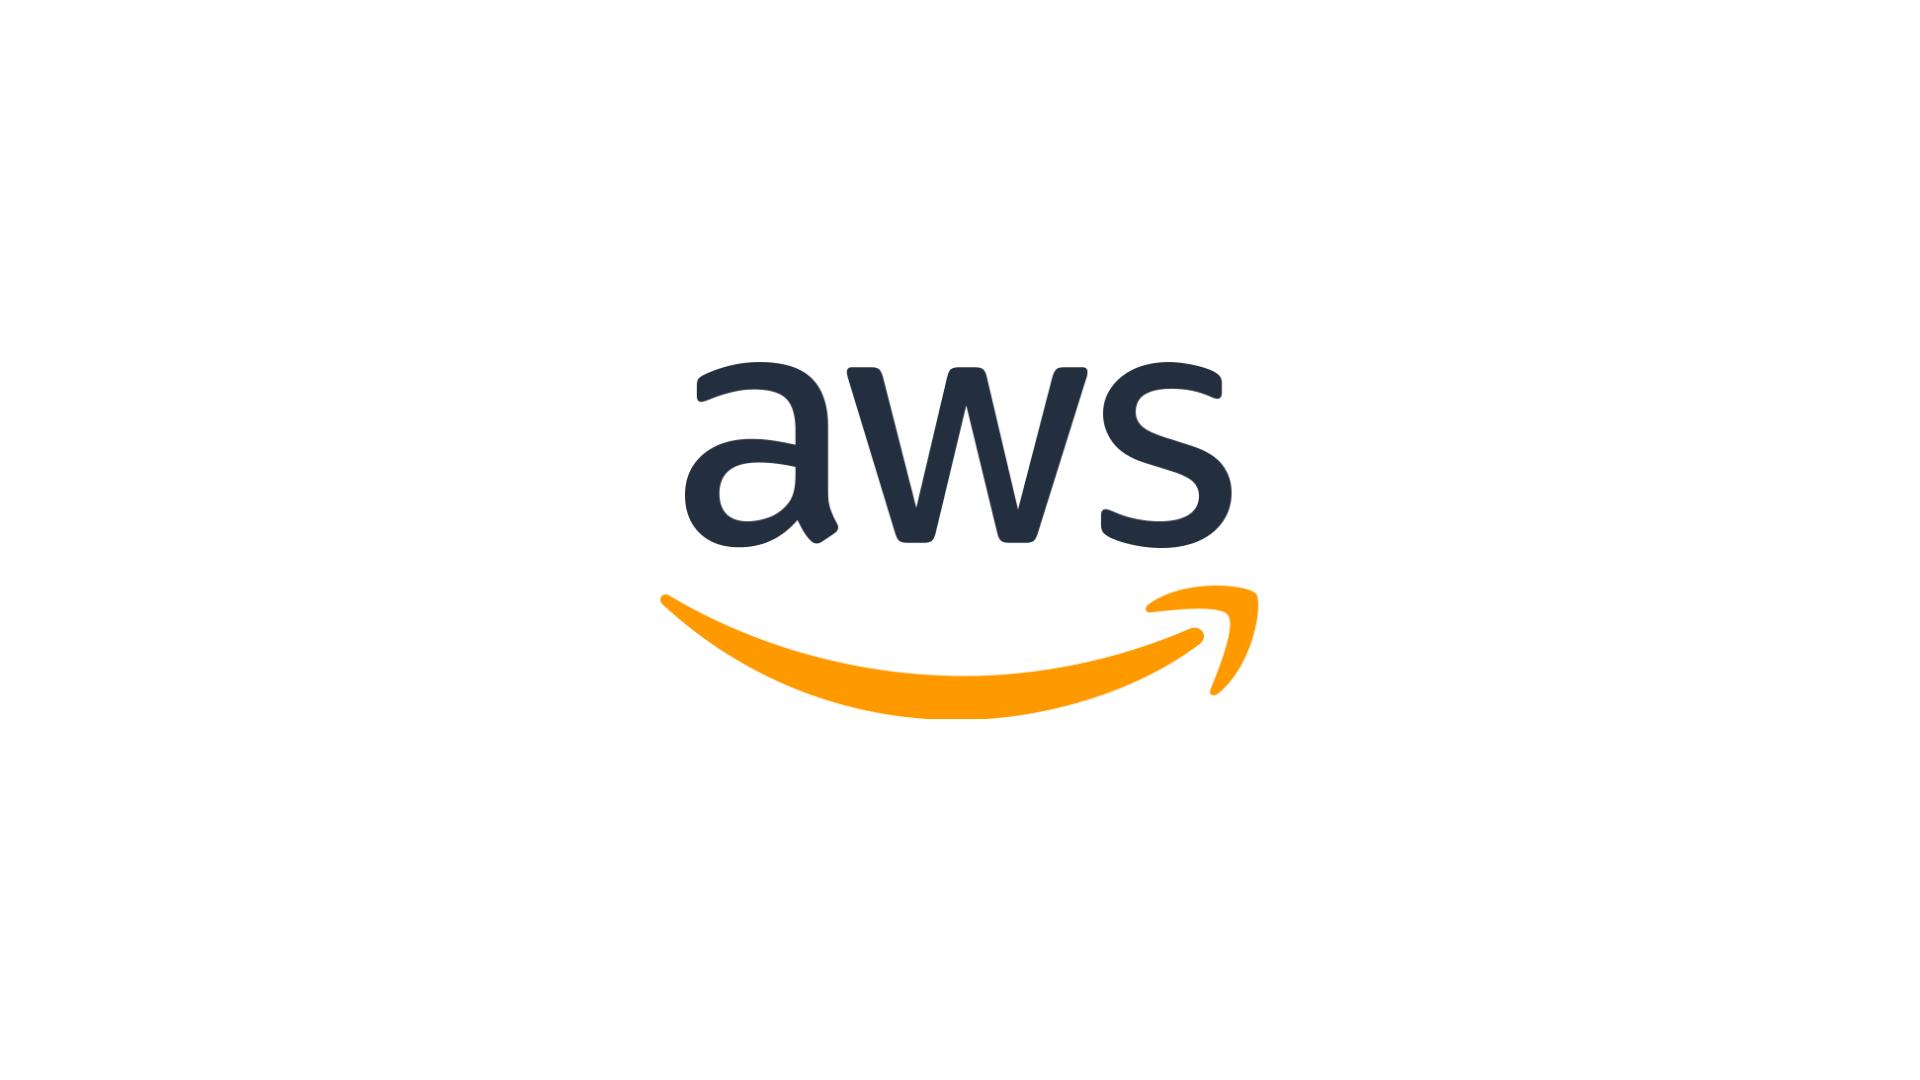 AWS運用の課題とサービス導入効果